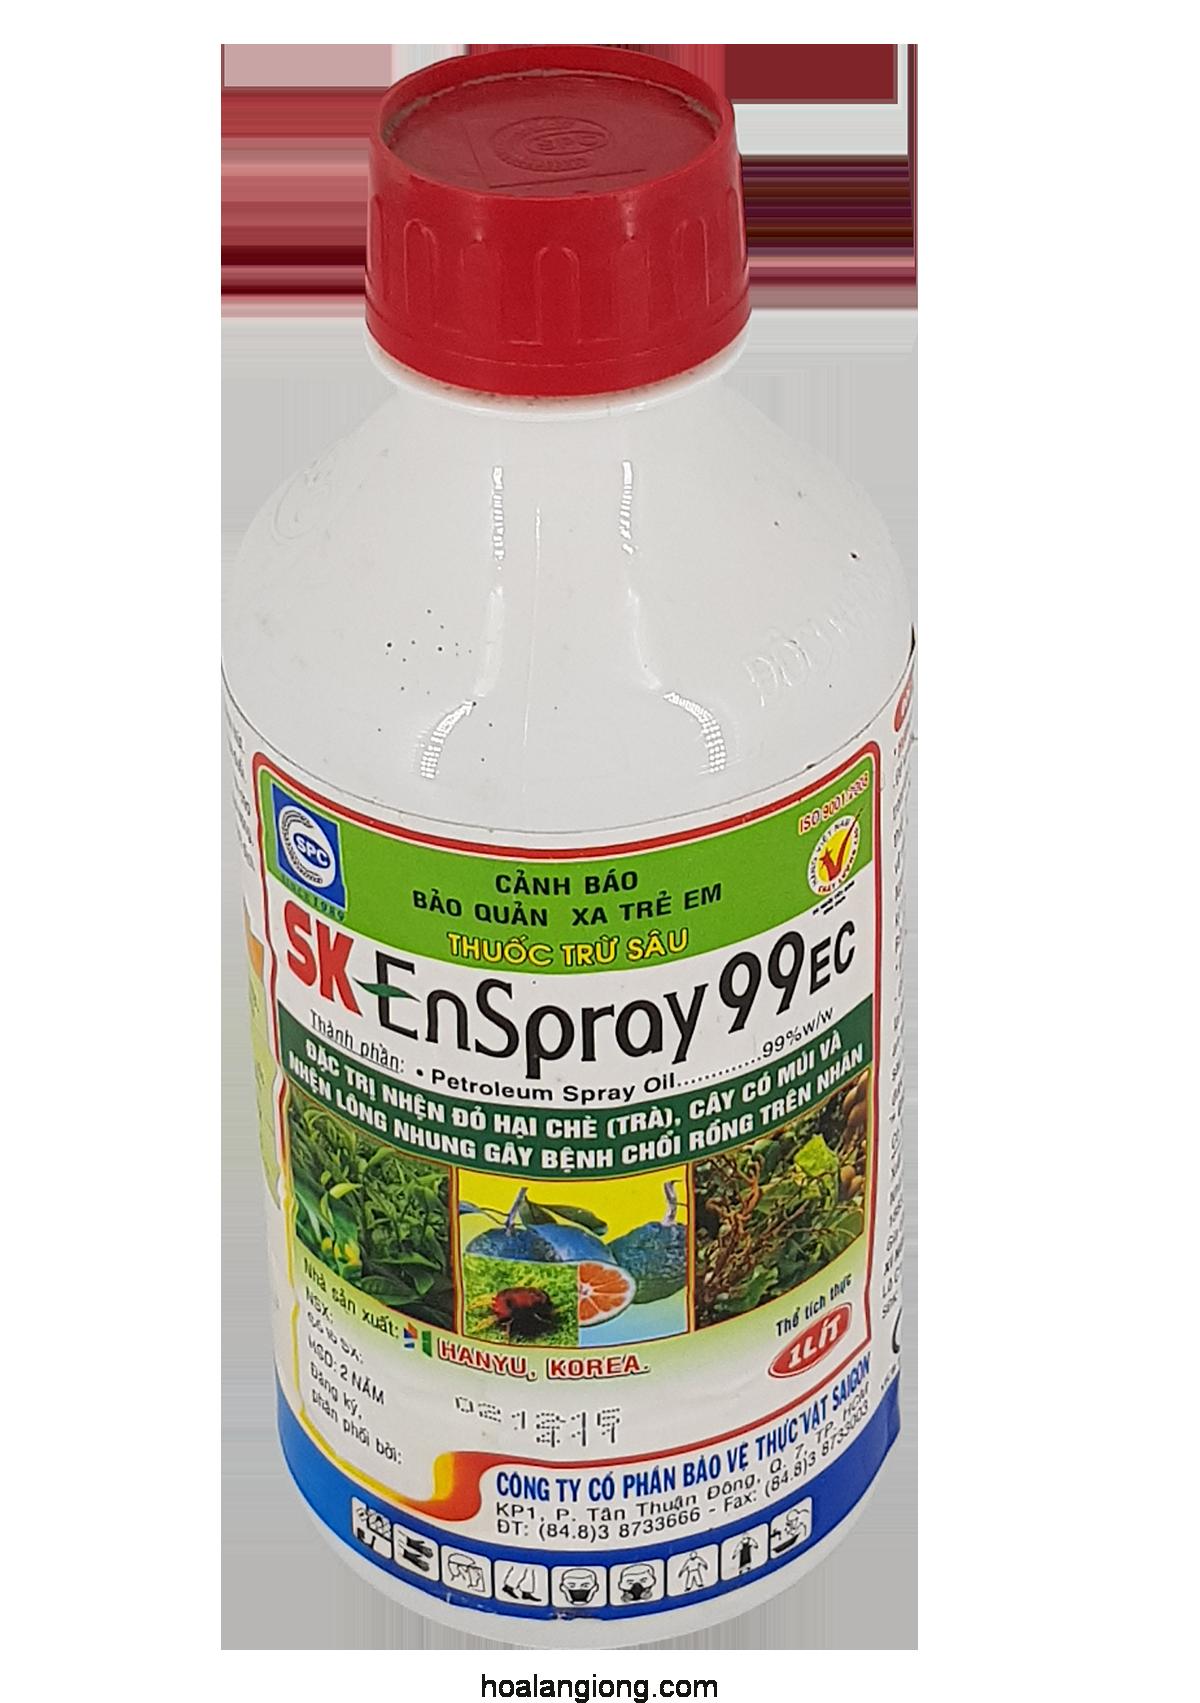 SK ENSPRAY 99EC